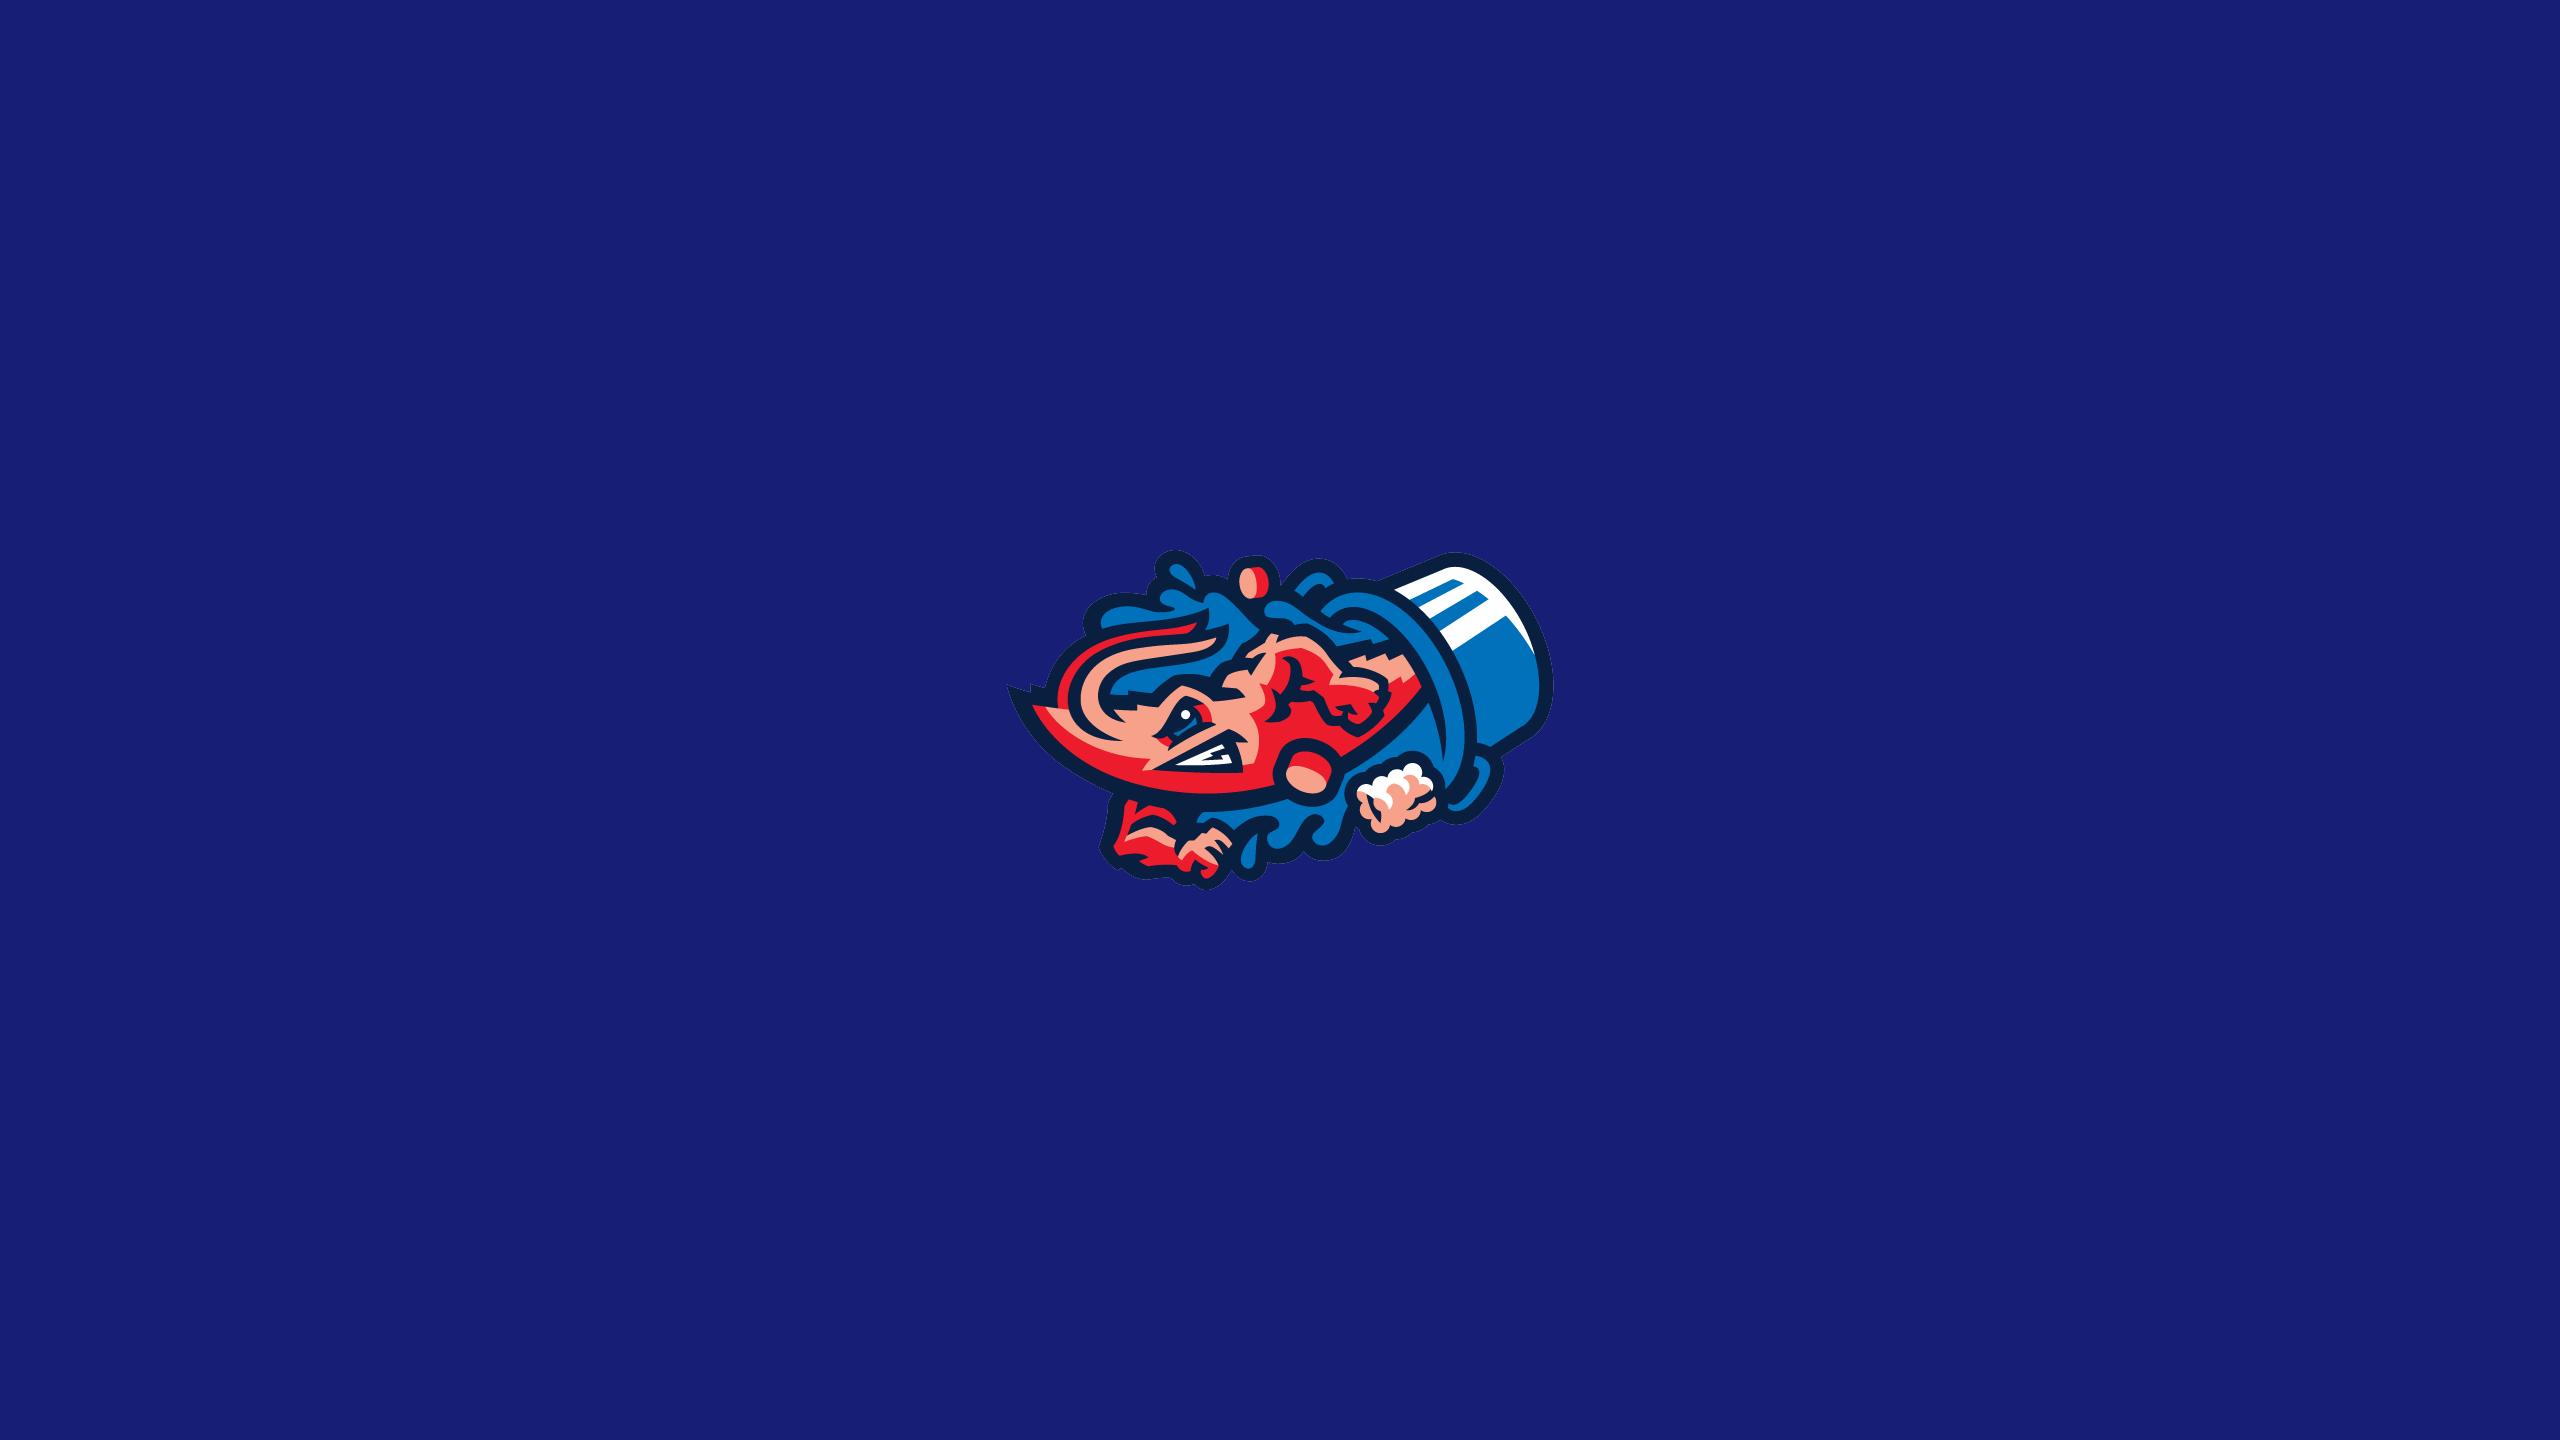 Jacksonville Jumbo Shrimp